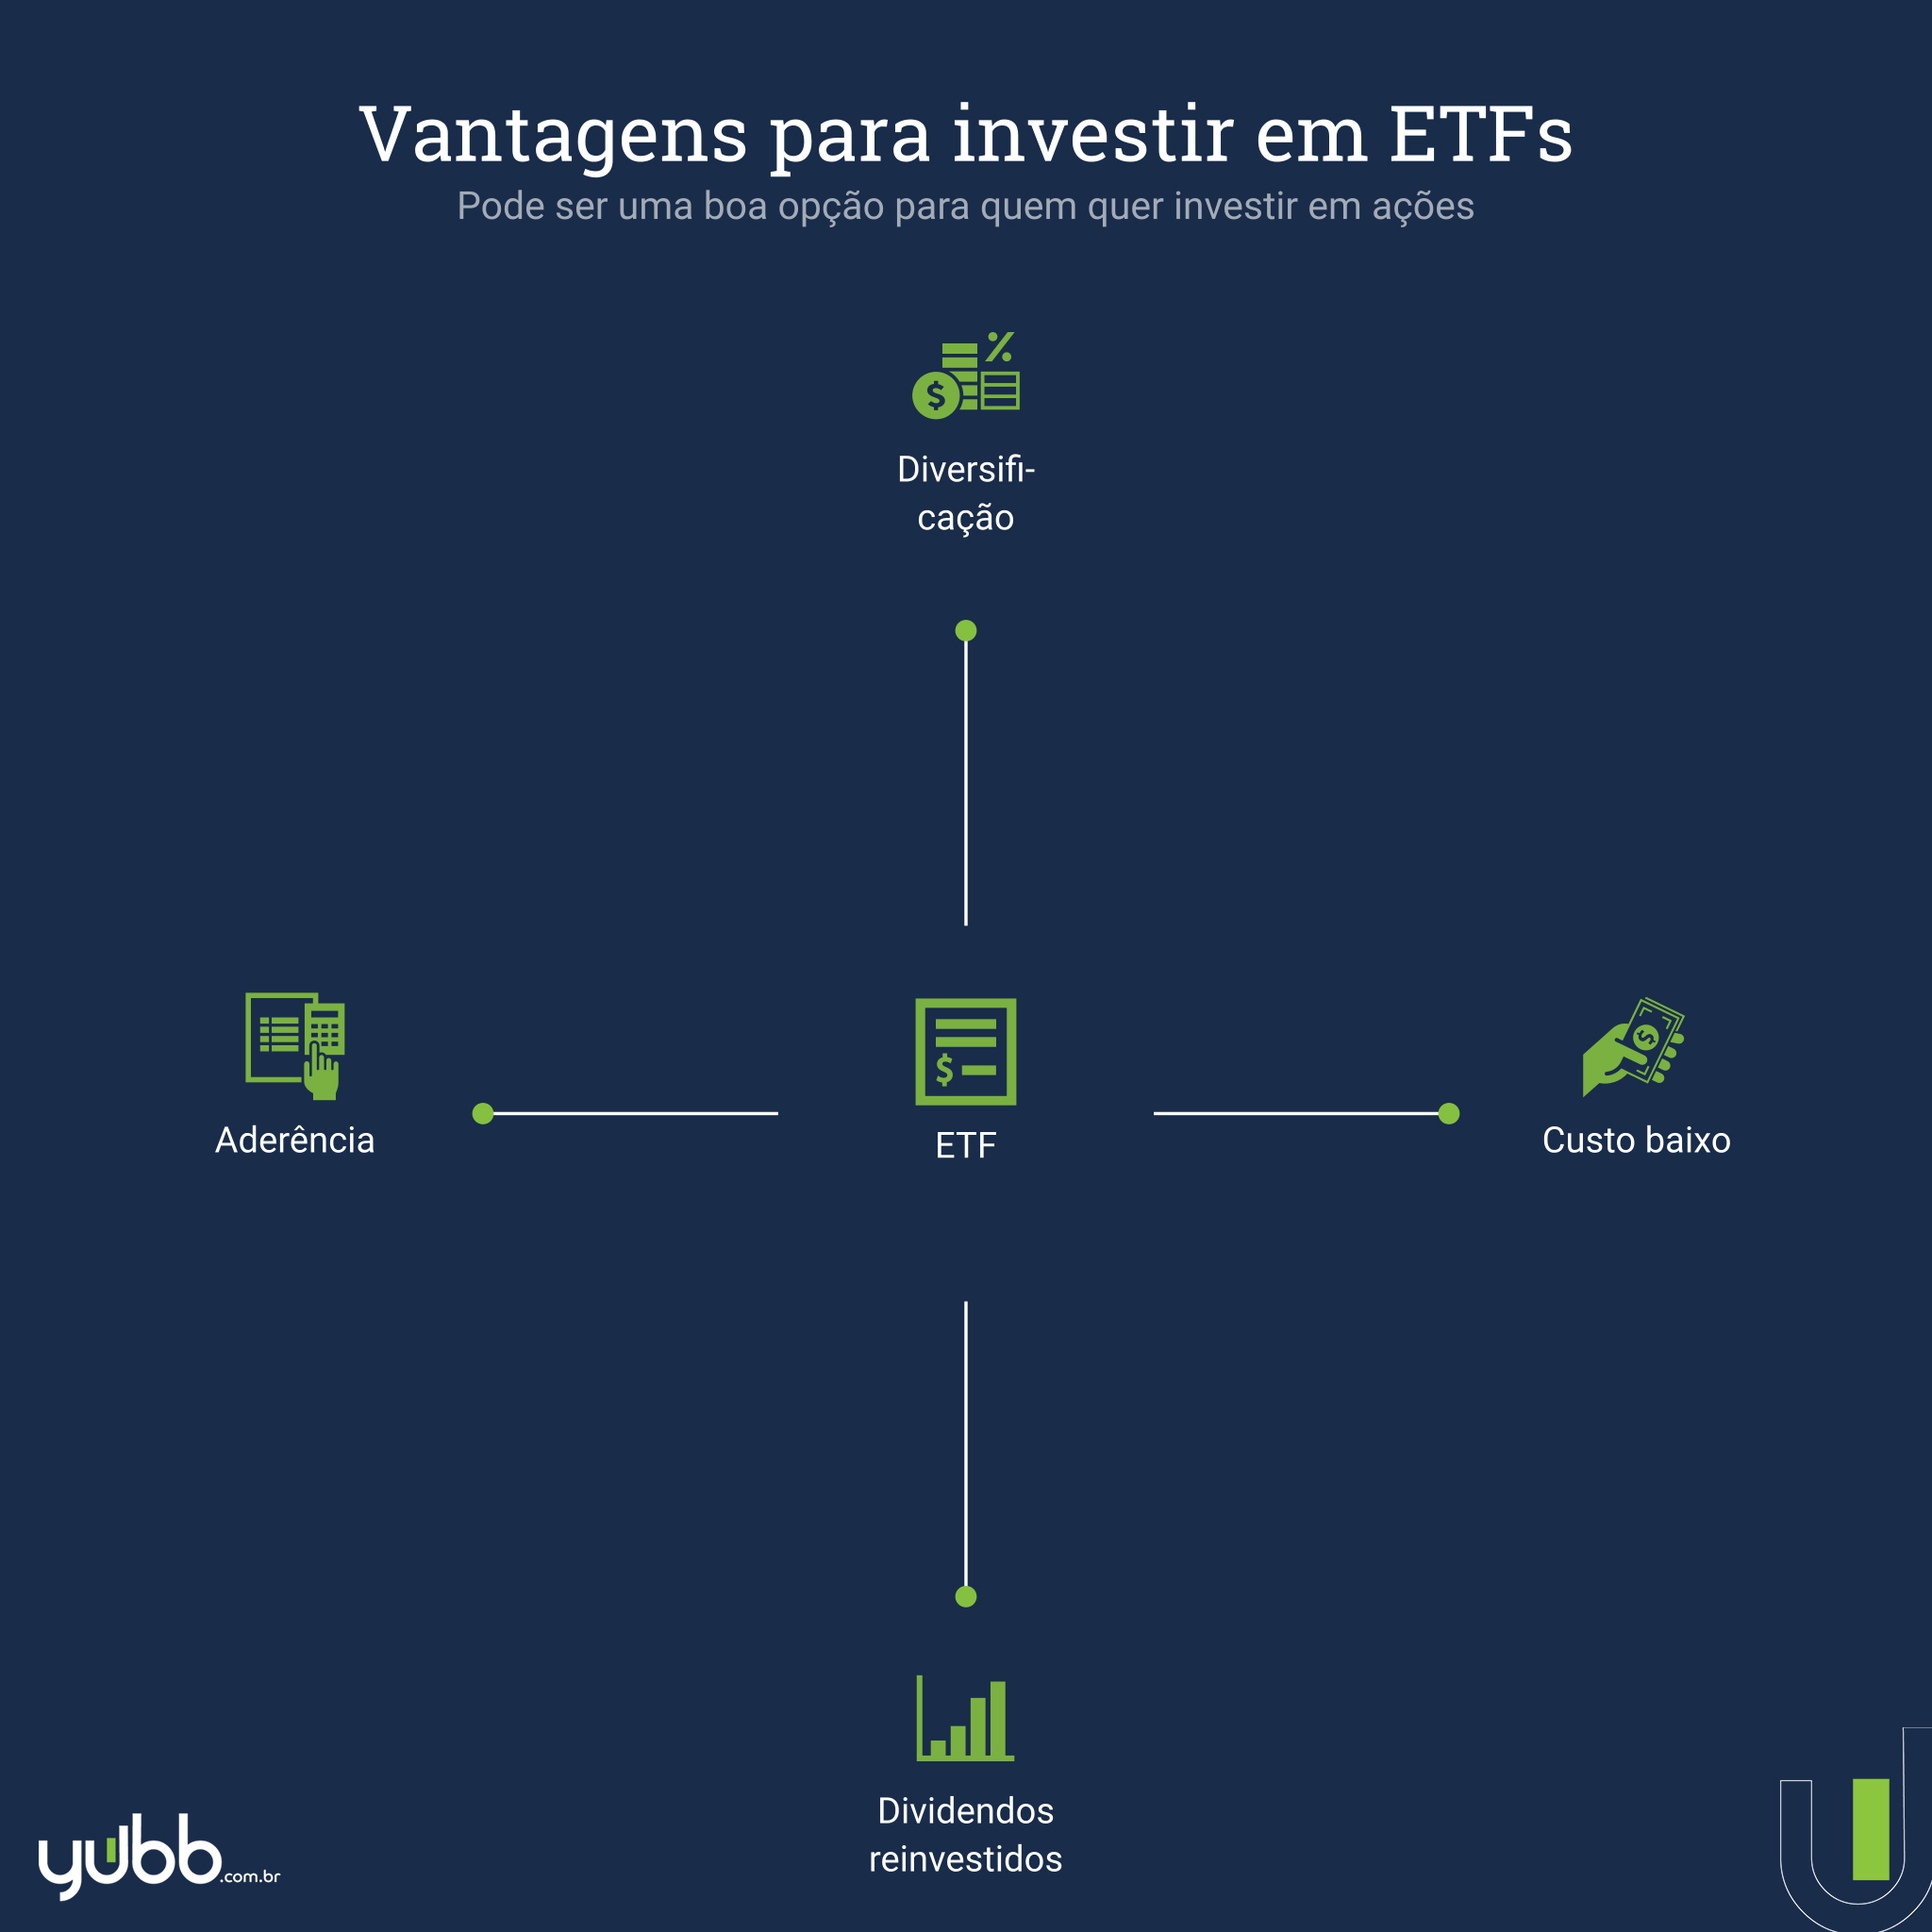 vantagens para investir em ETFs